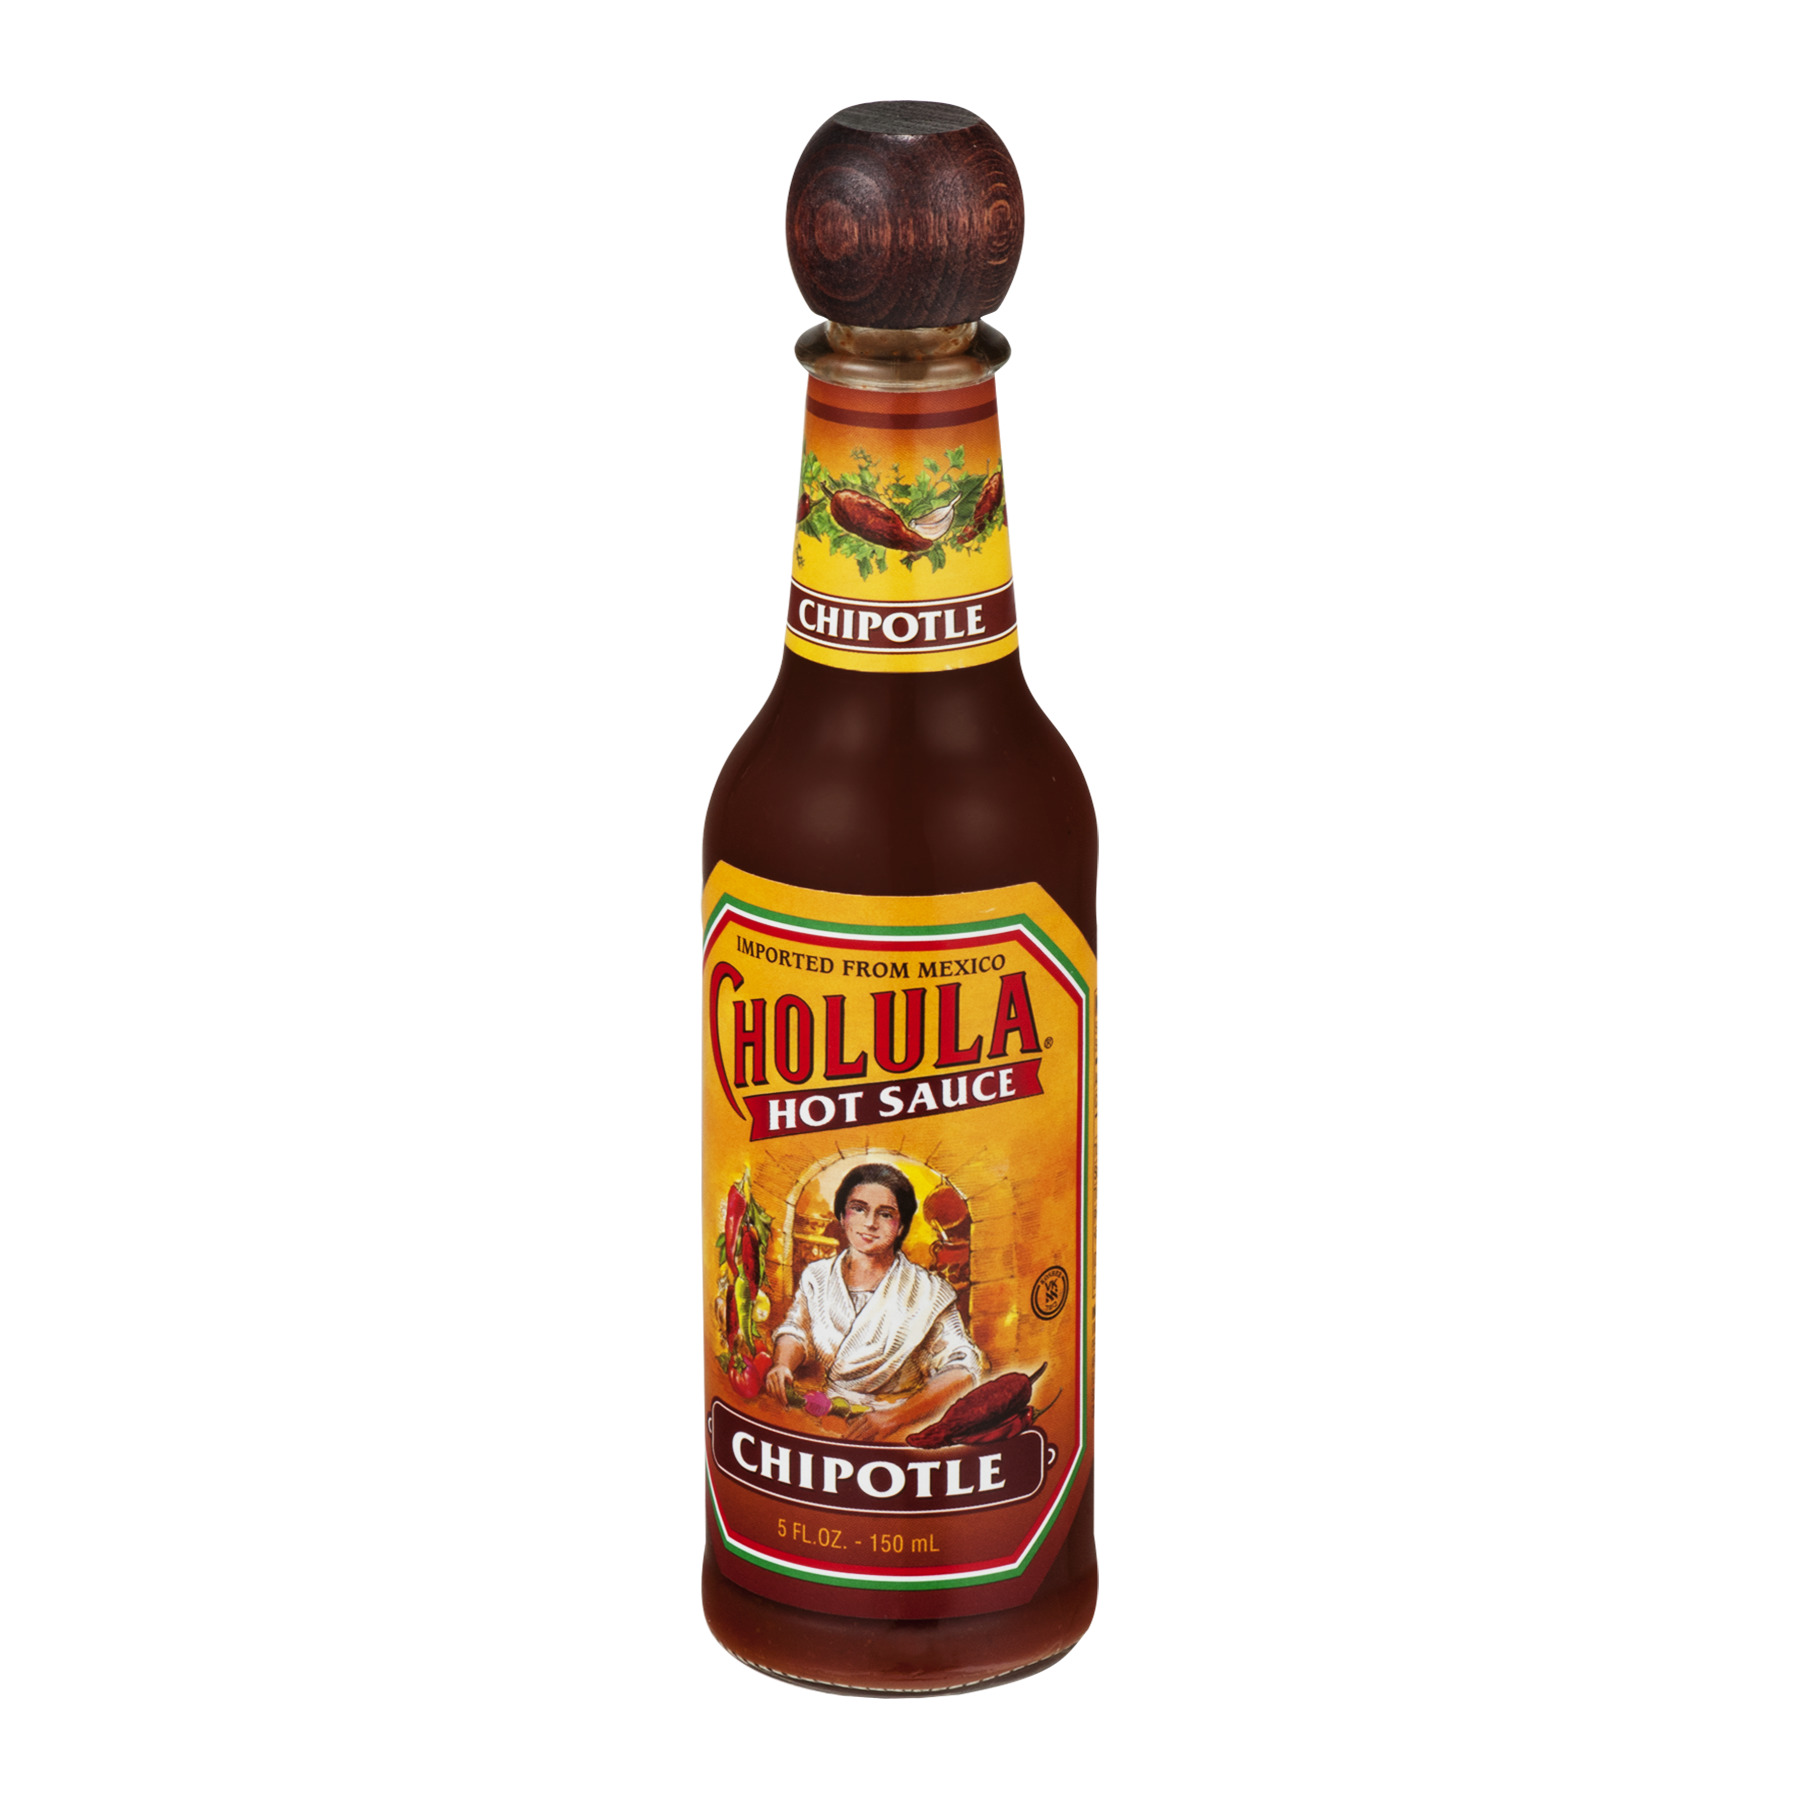 Cholula Chipotle Hot Sauce, 5 fl oz - Walmart.com